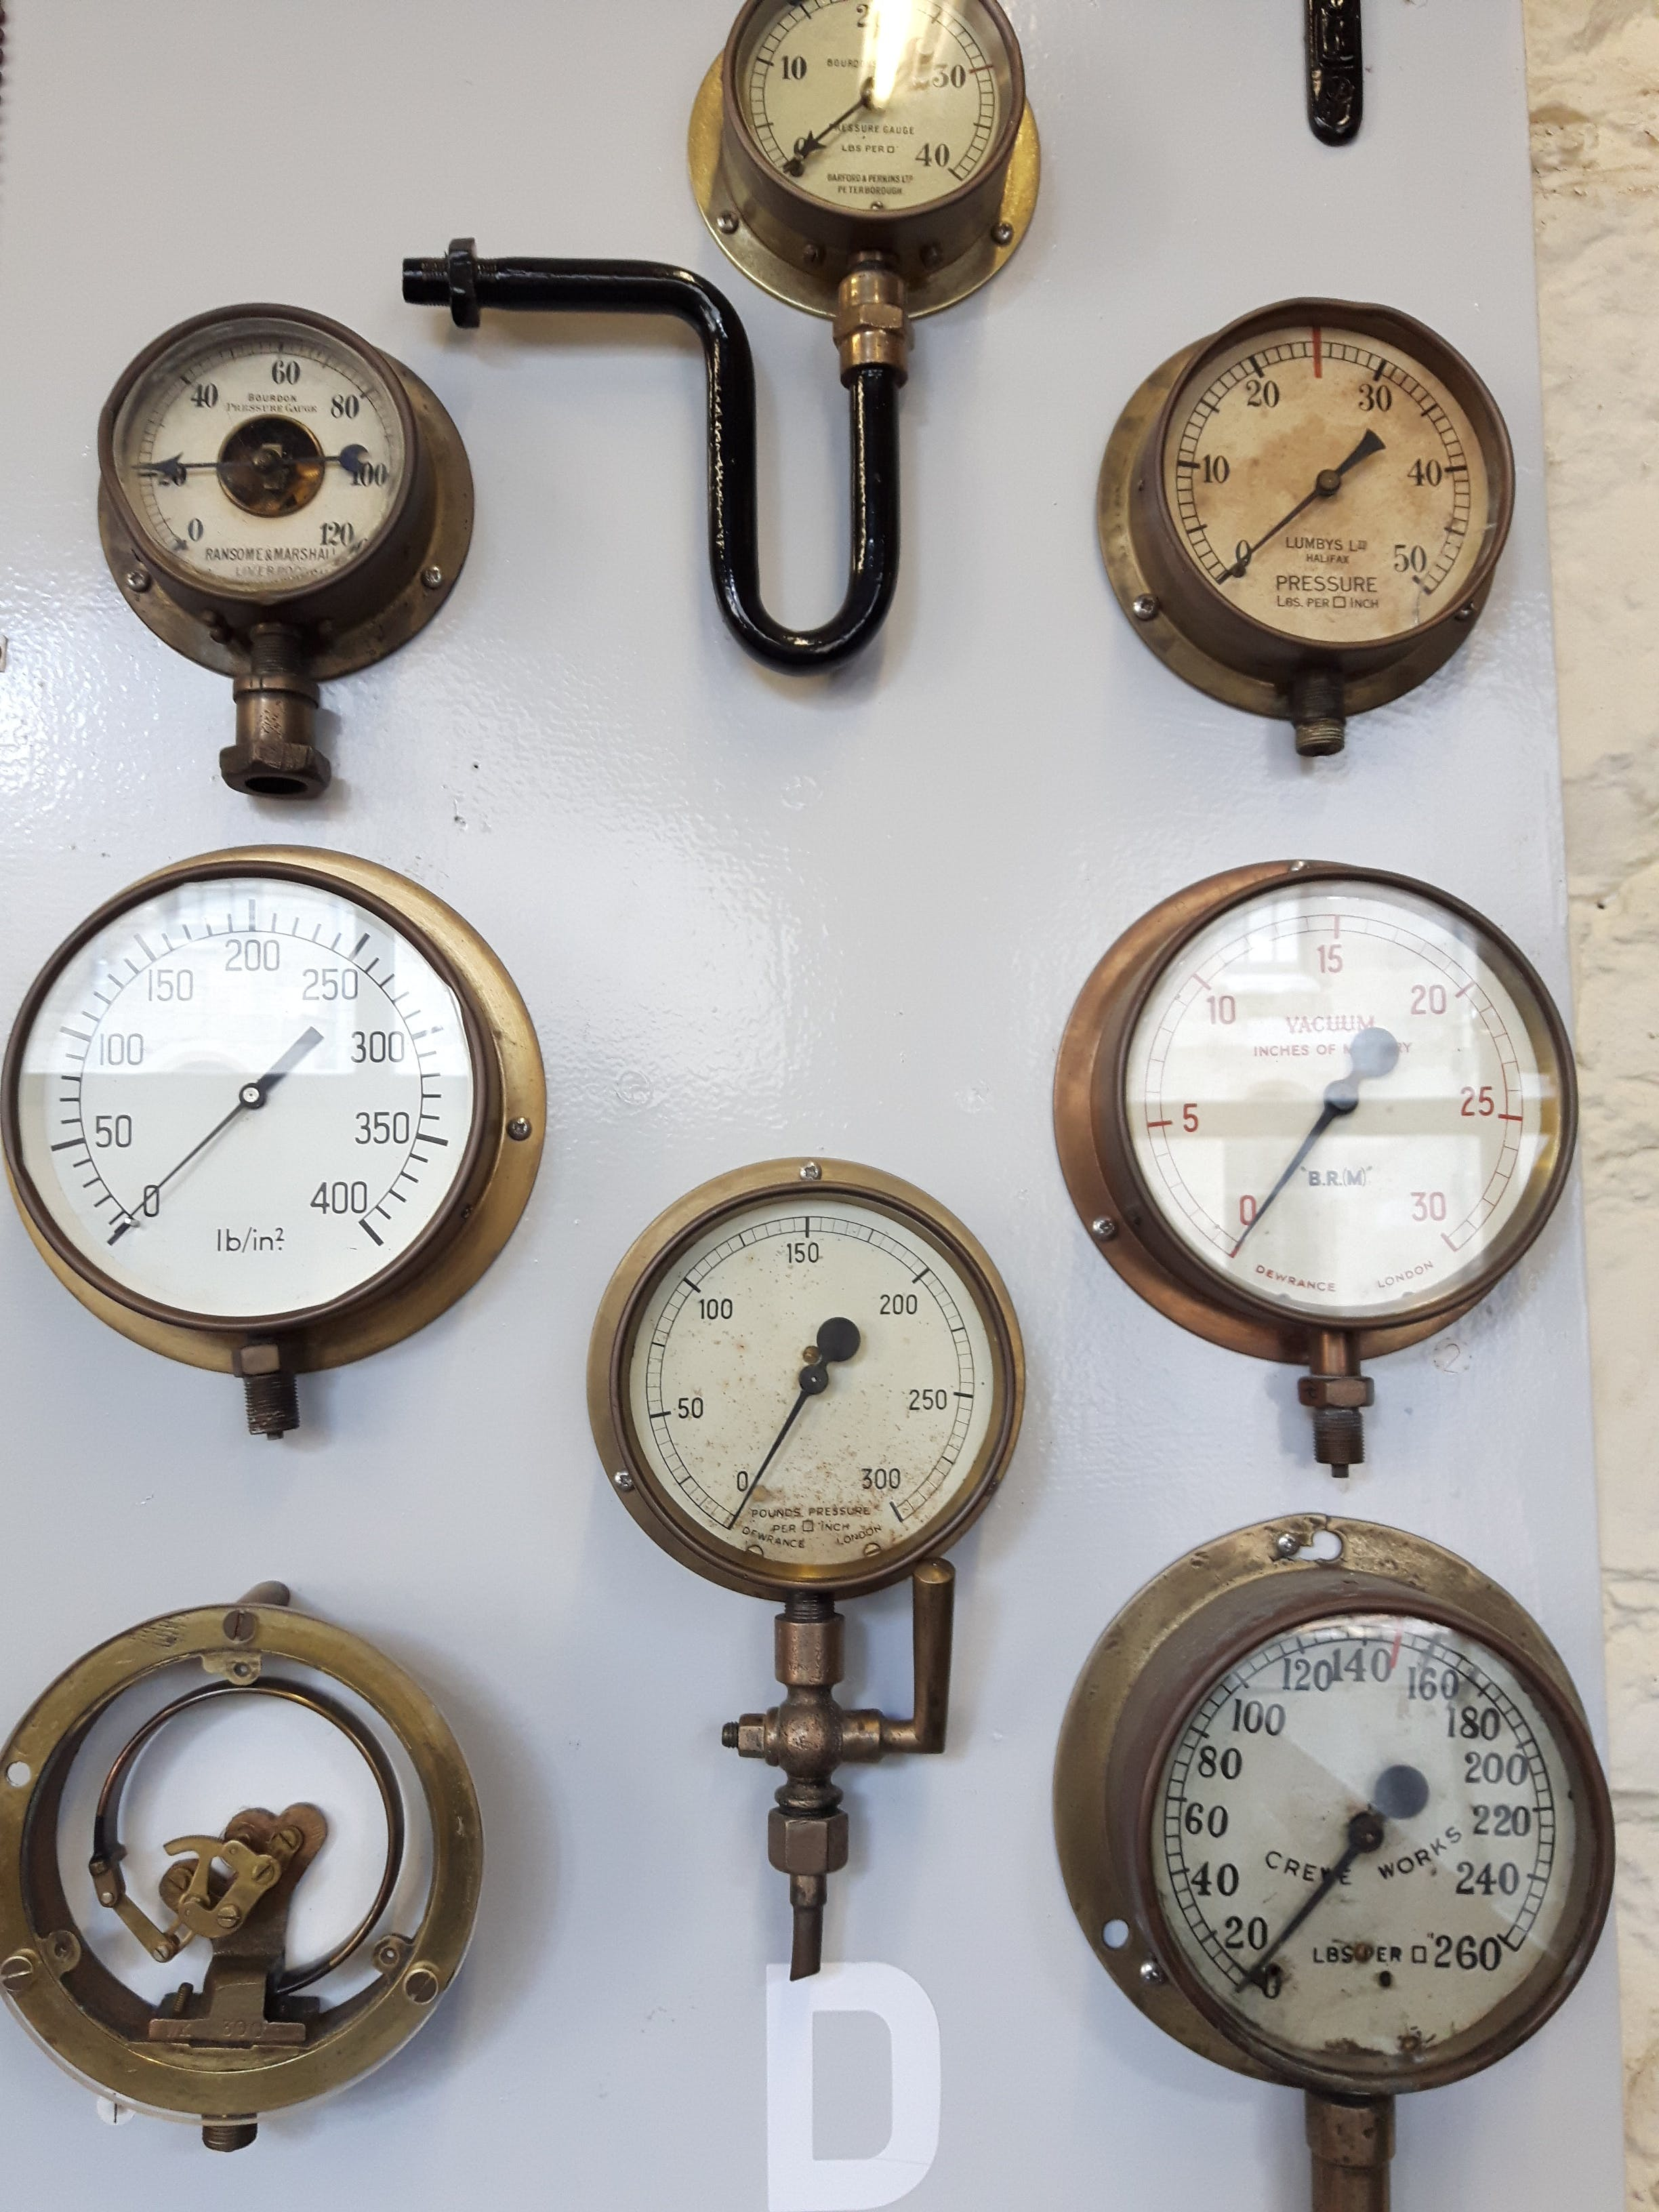 Free stock photo of dials, pressure guage, steam, steam engine